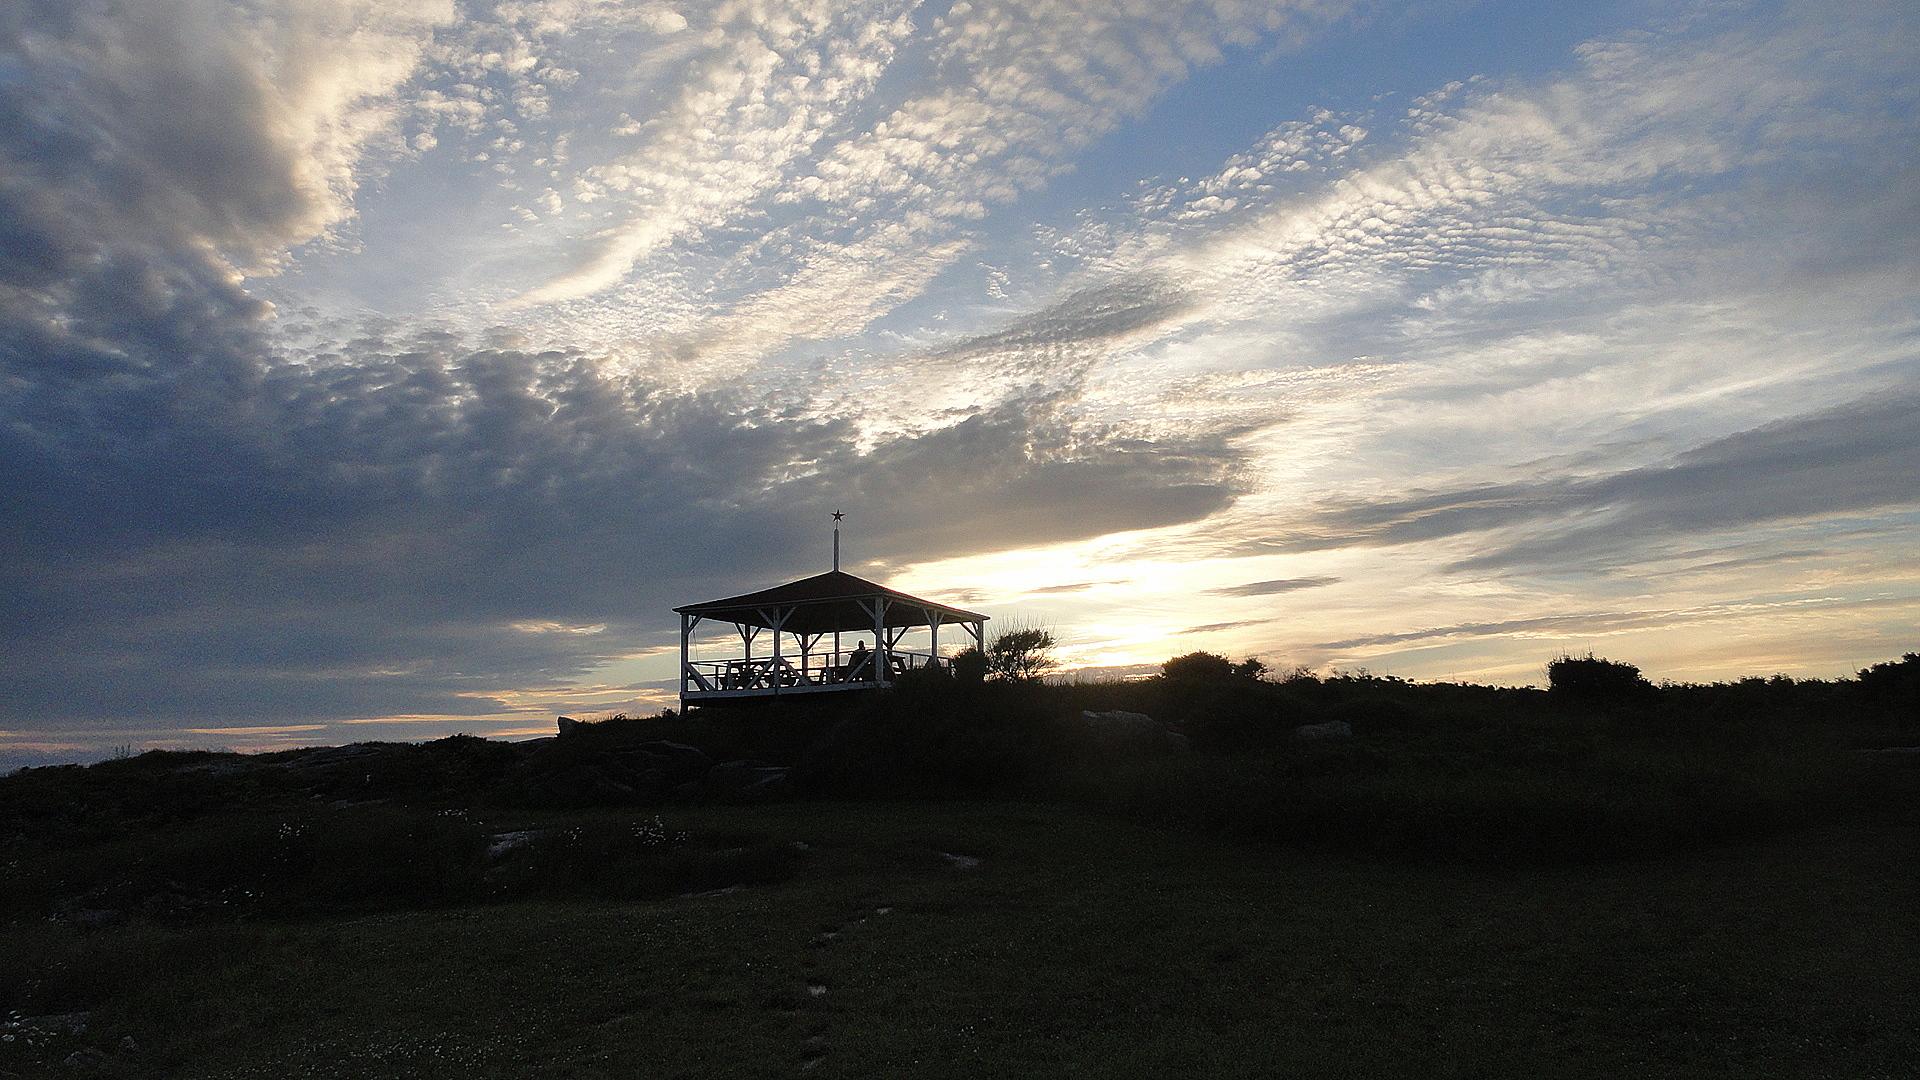 Summer House & Sunset Clouds